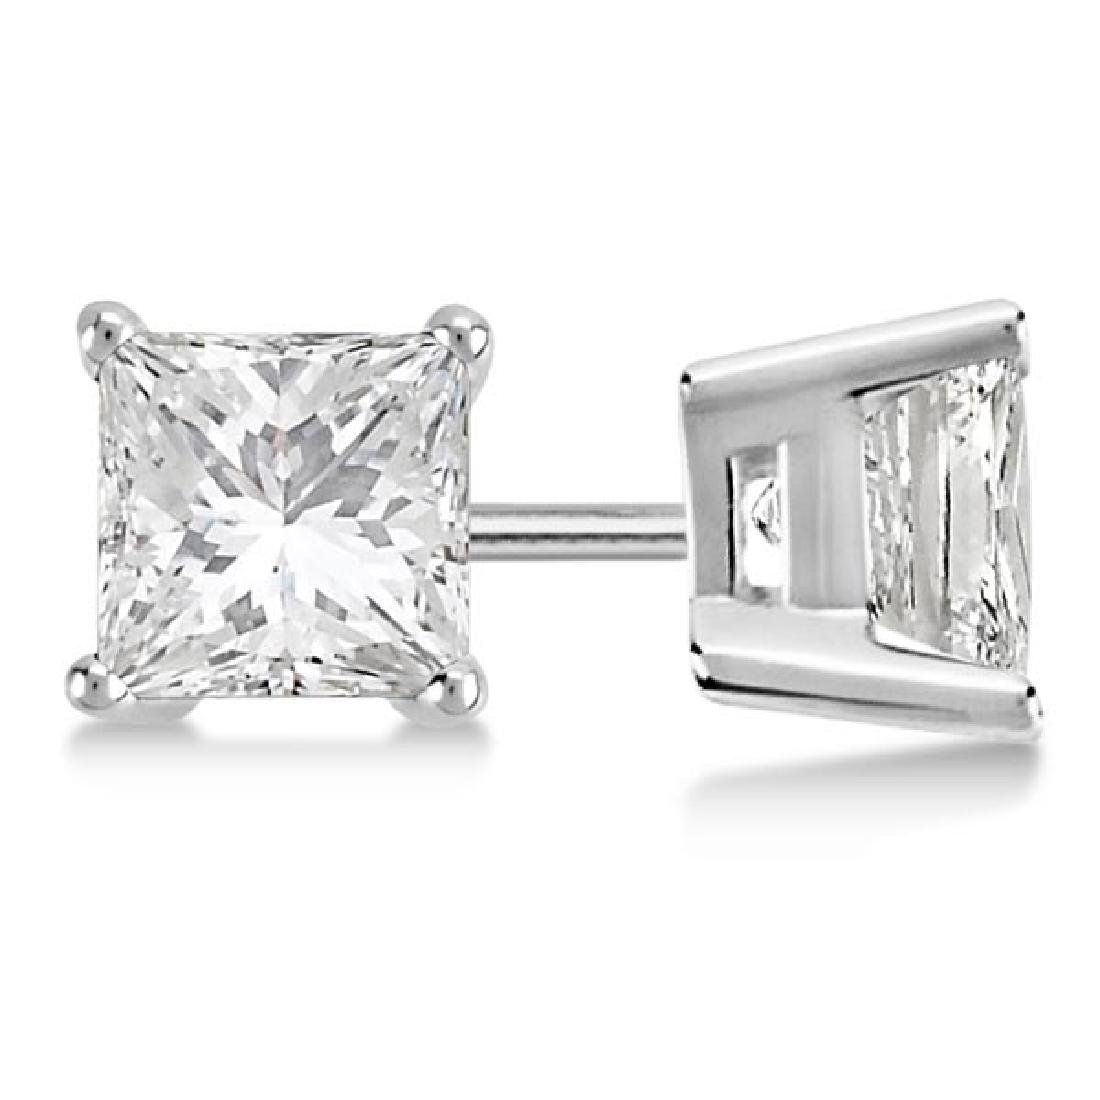 Certified 0.9 CTW Princess Diamond Stud Earrings K/SI1